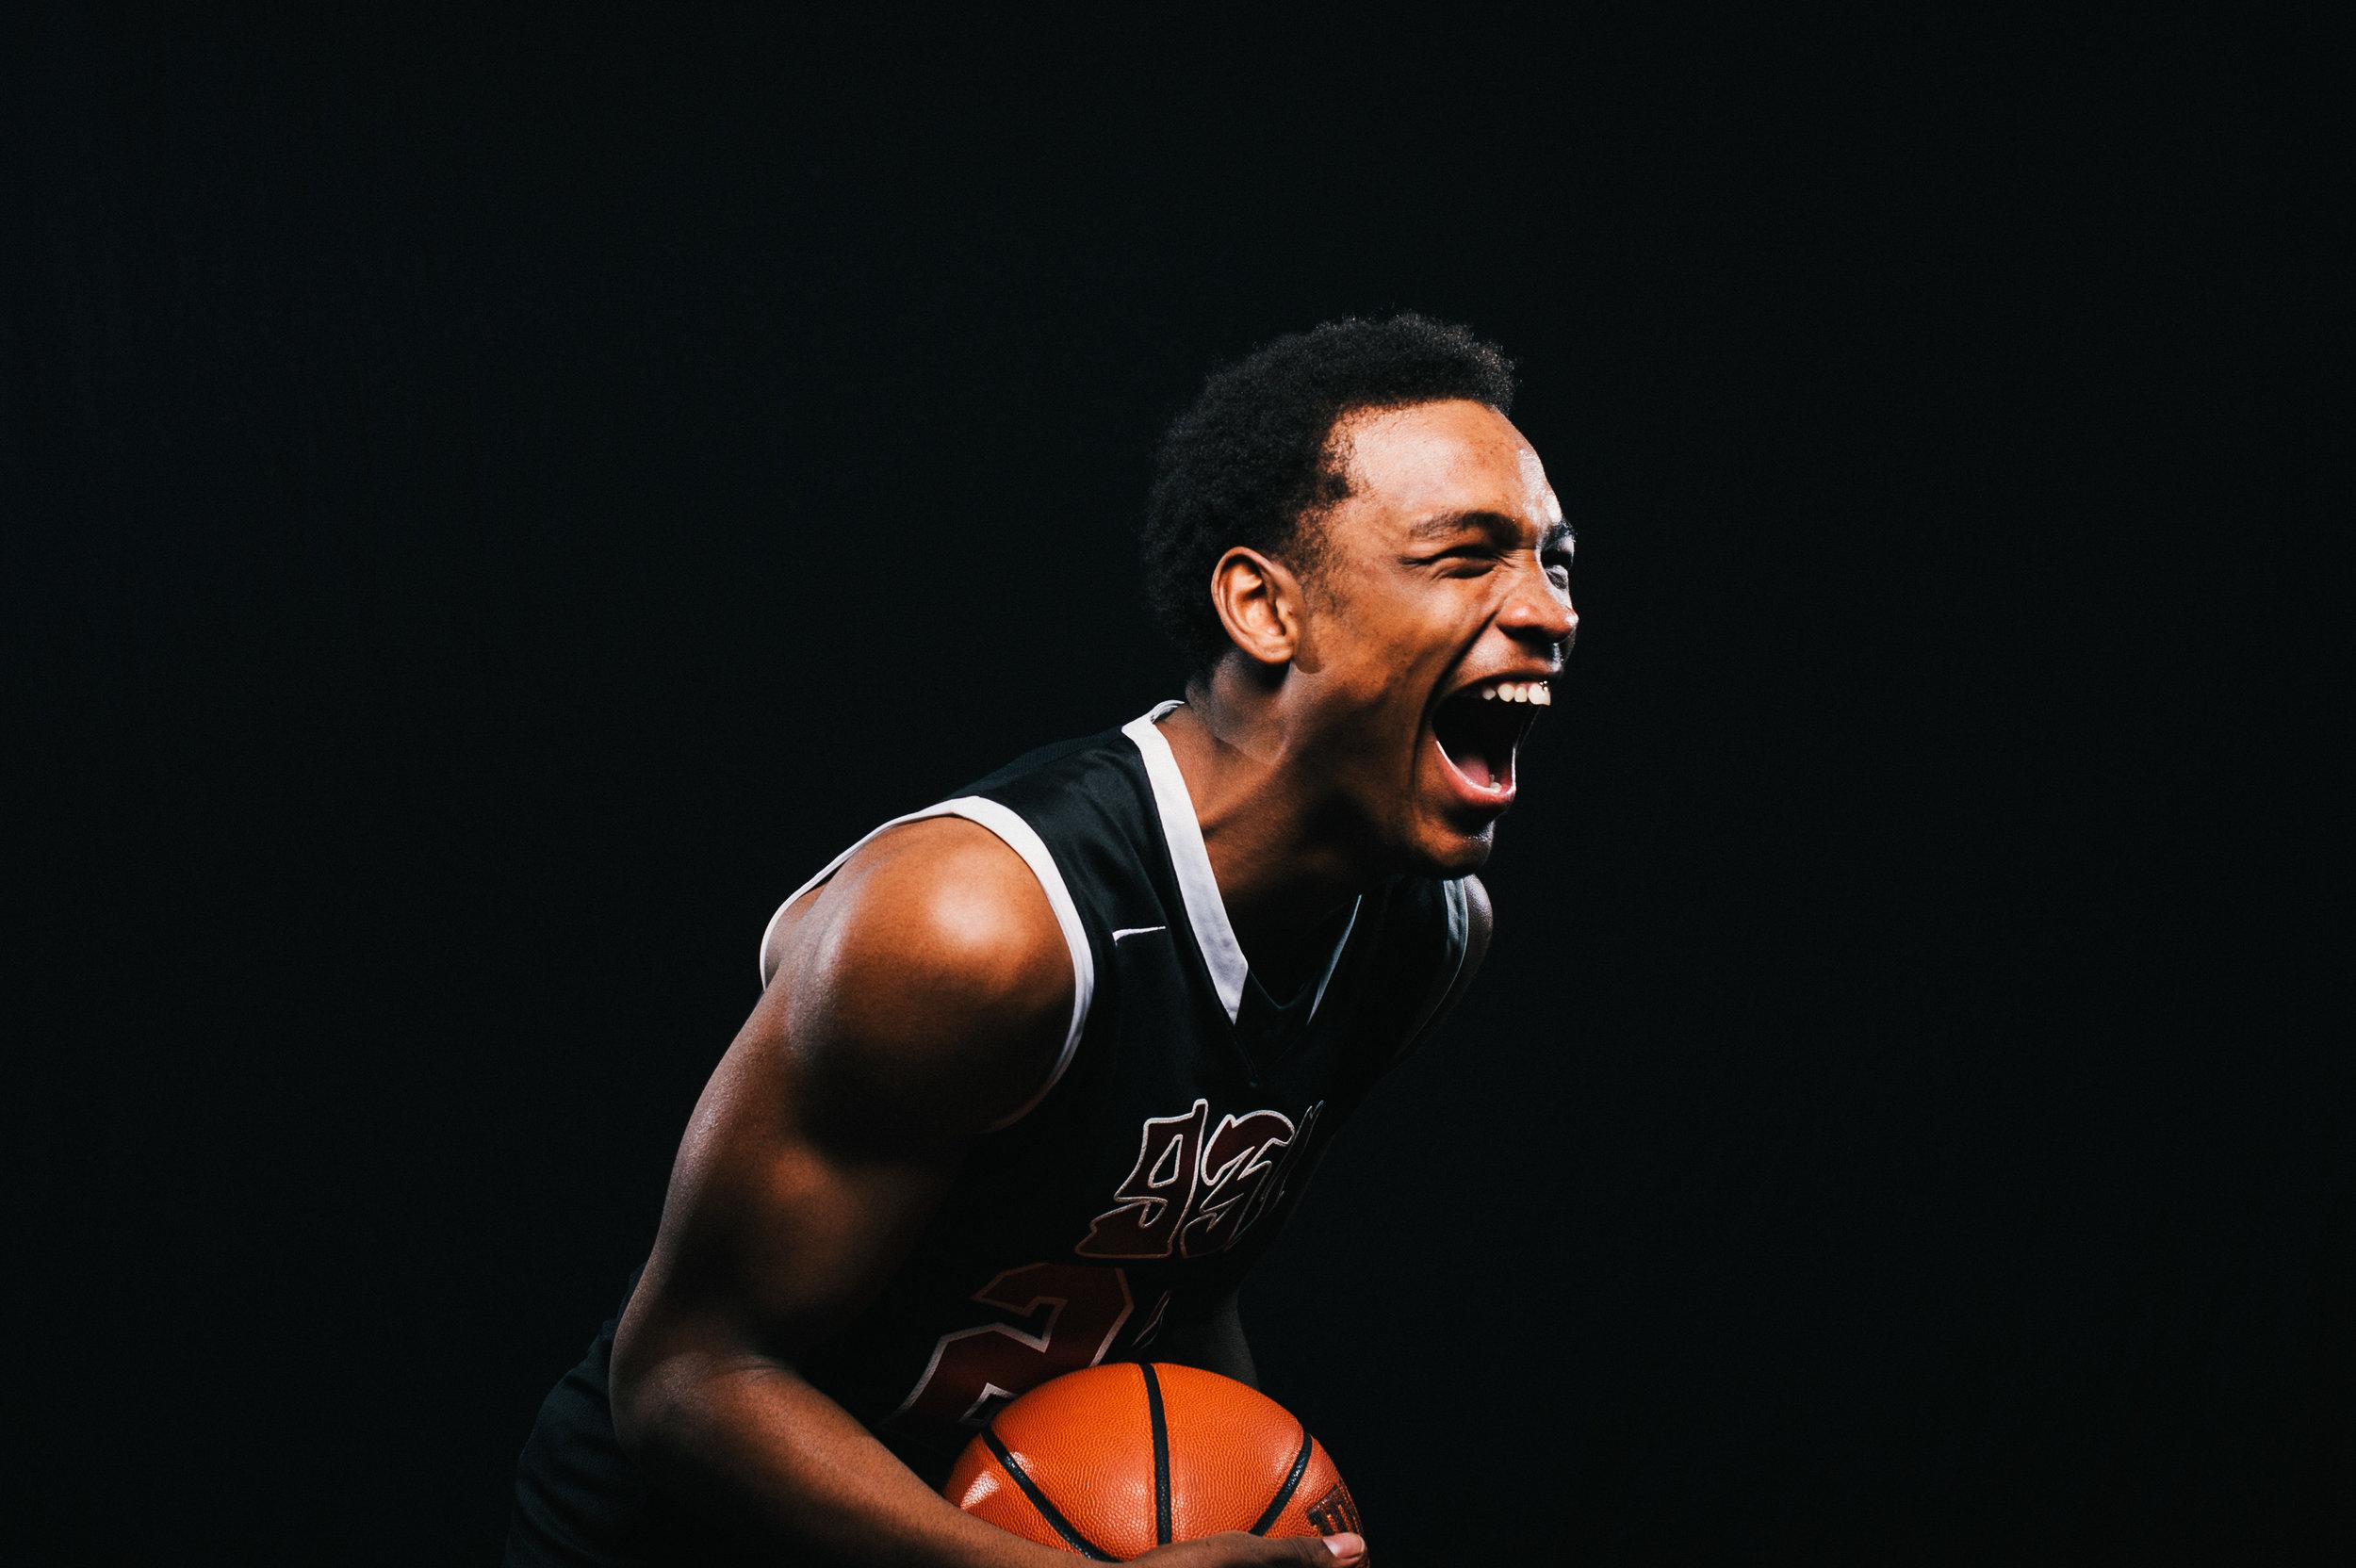 931-basketball-portraits-2014-204822.jpg